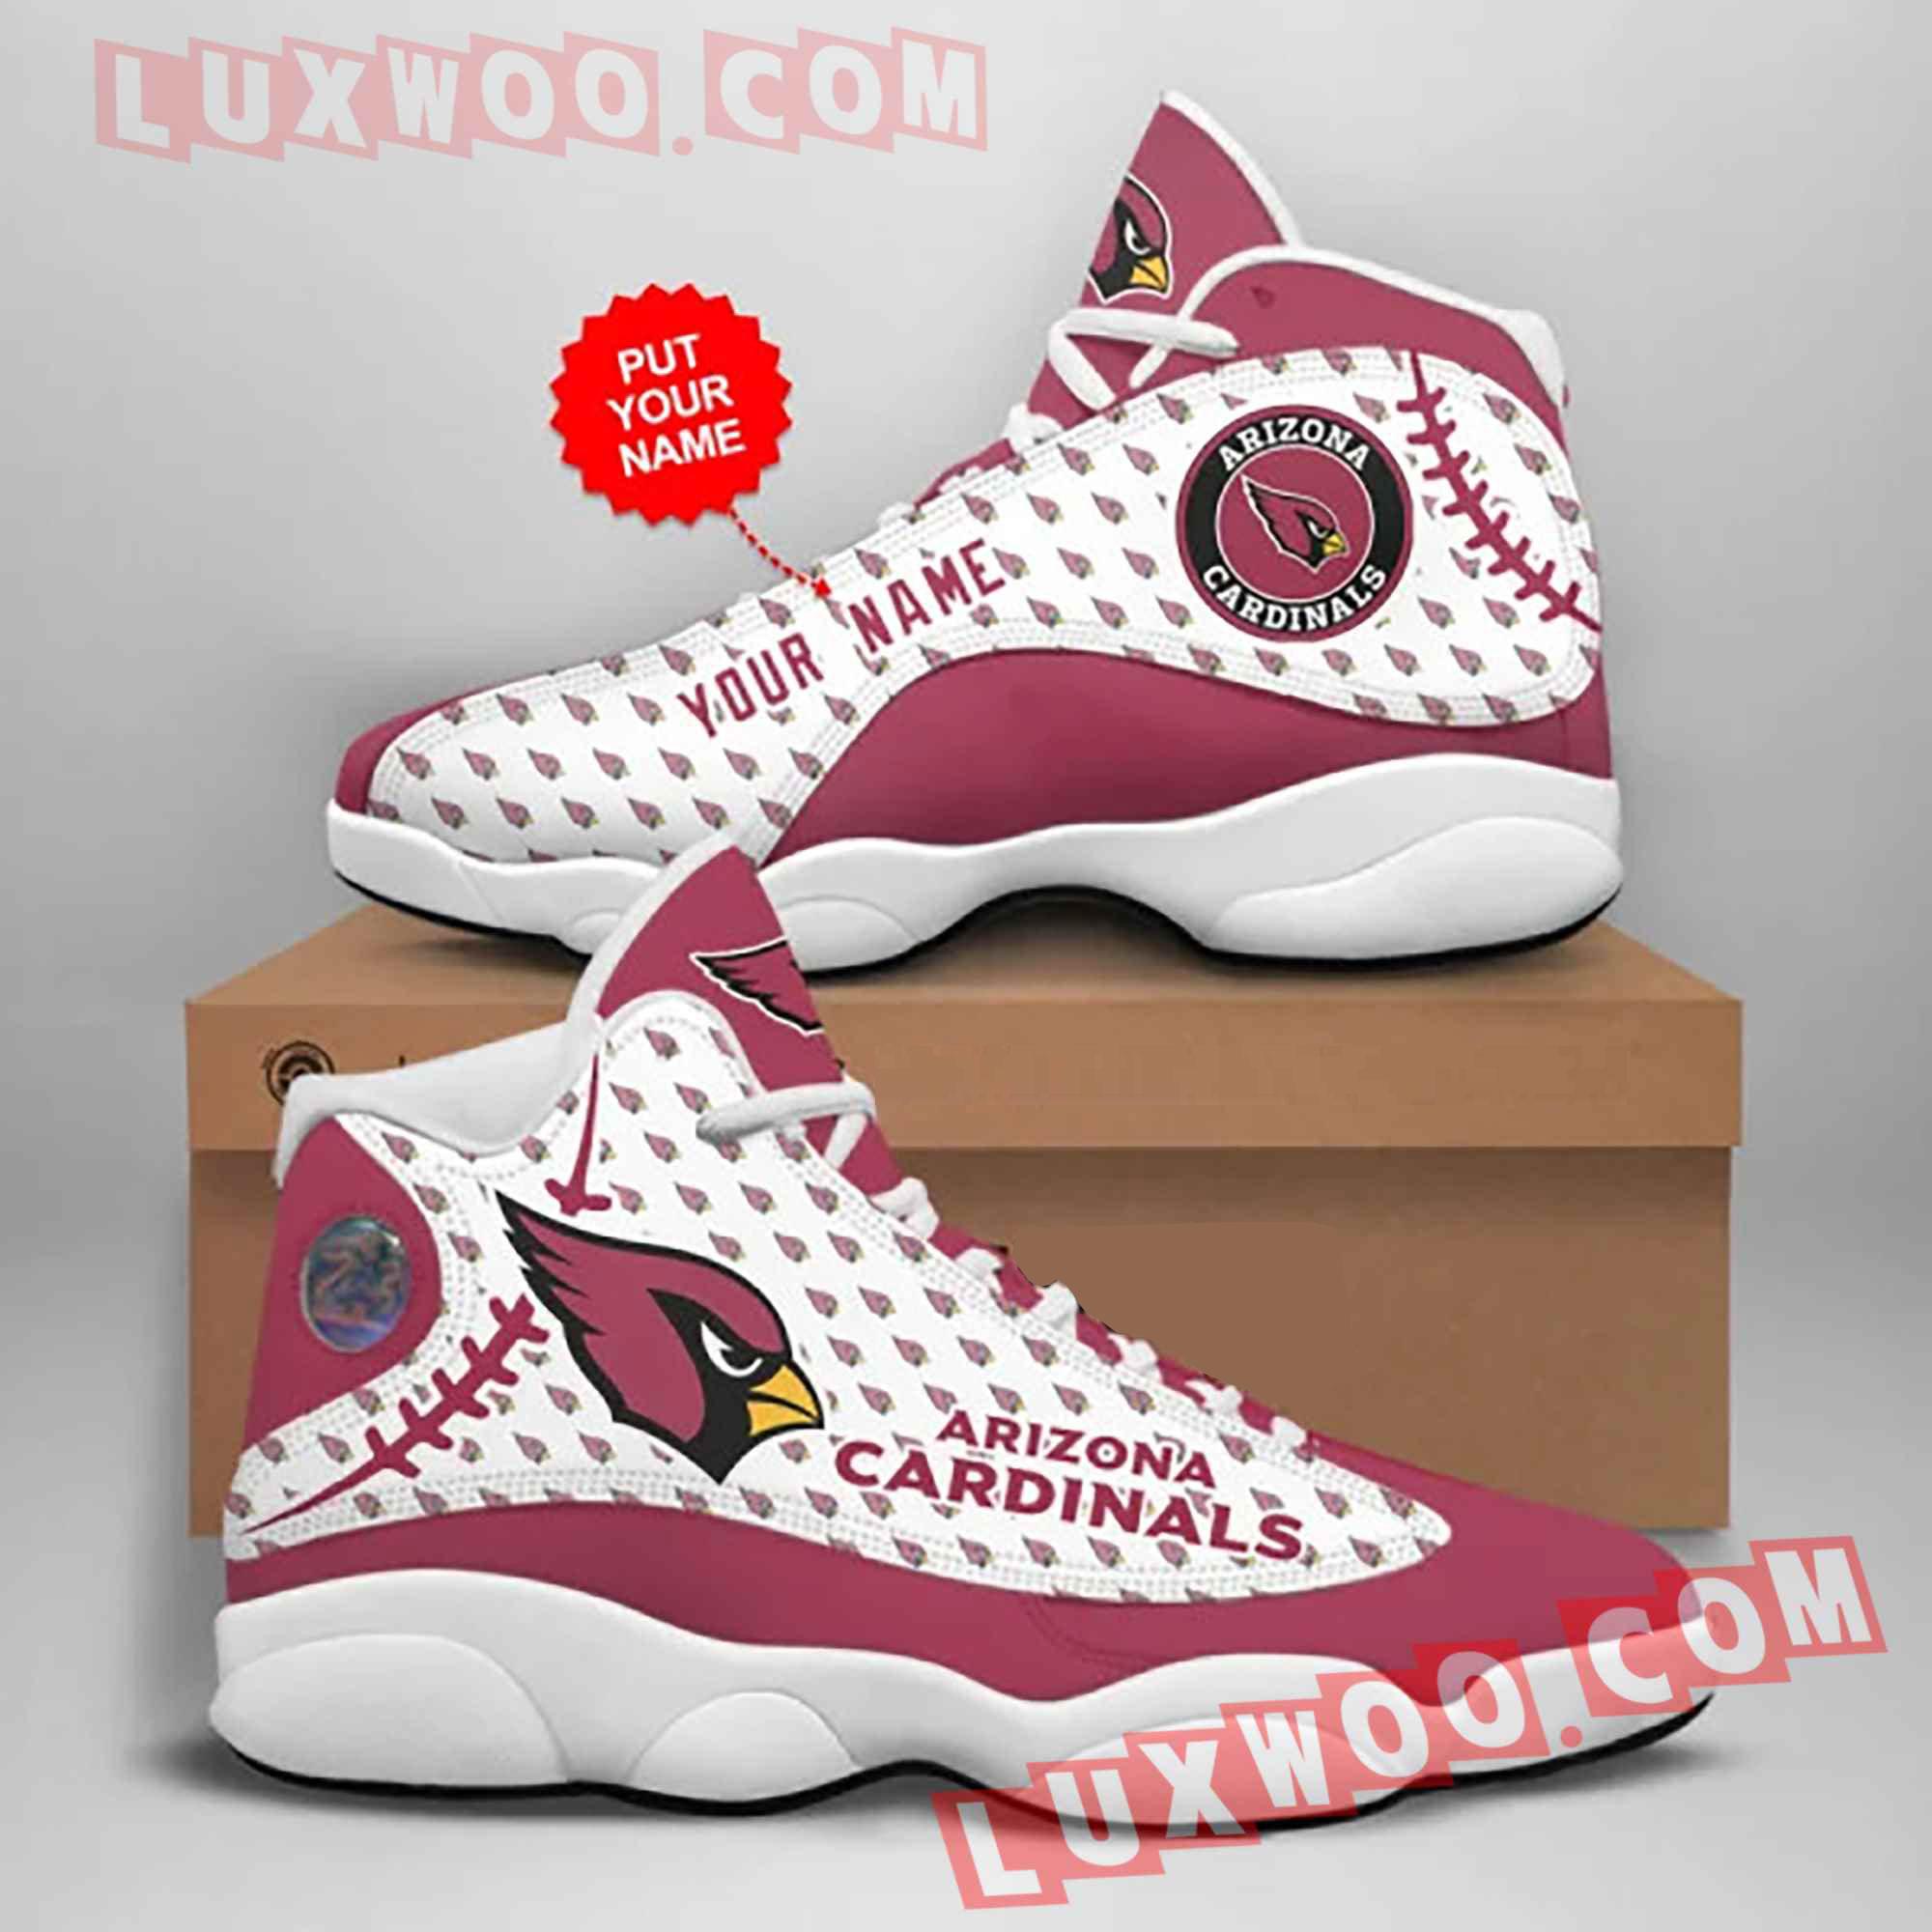 Arizona Cardinals Nfl Air Jordan 13 Custom Shoes Sneaker V1 Full Size